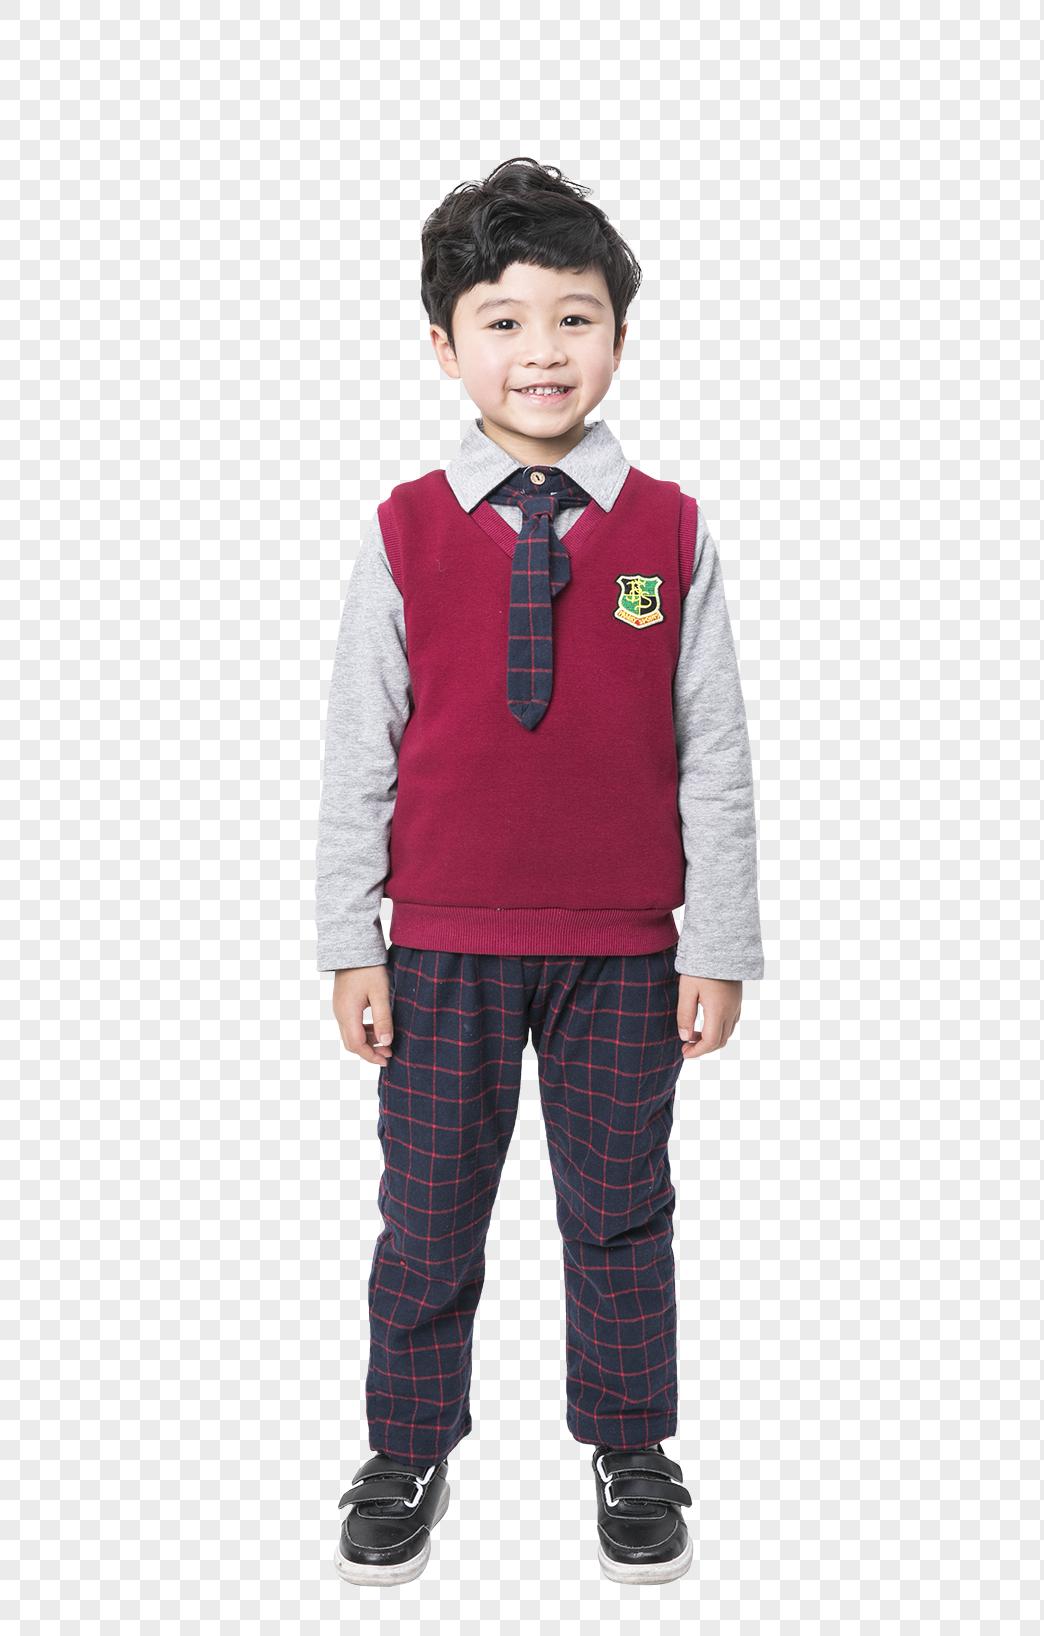 Children In School Uniform Png Image Picture Free Download